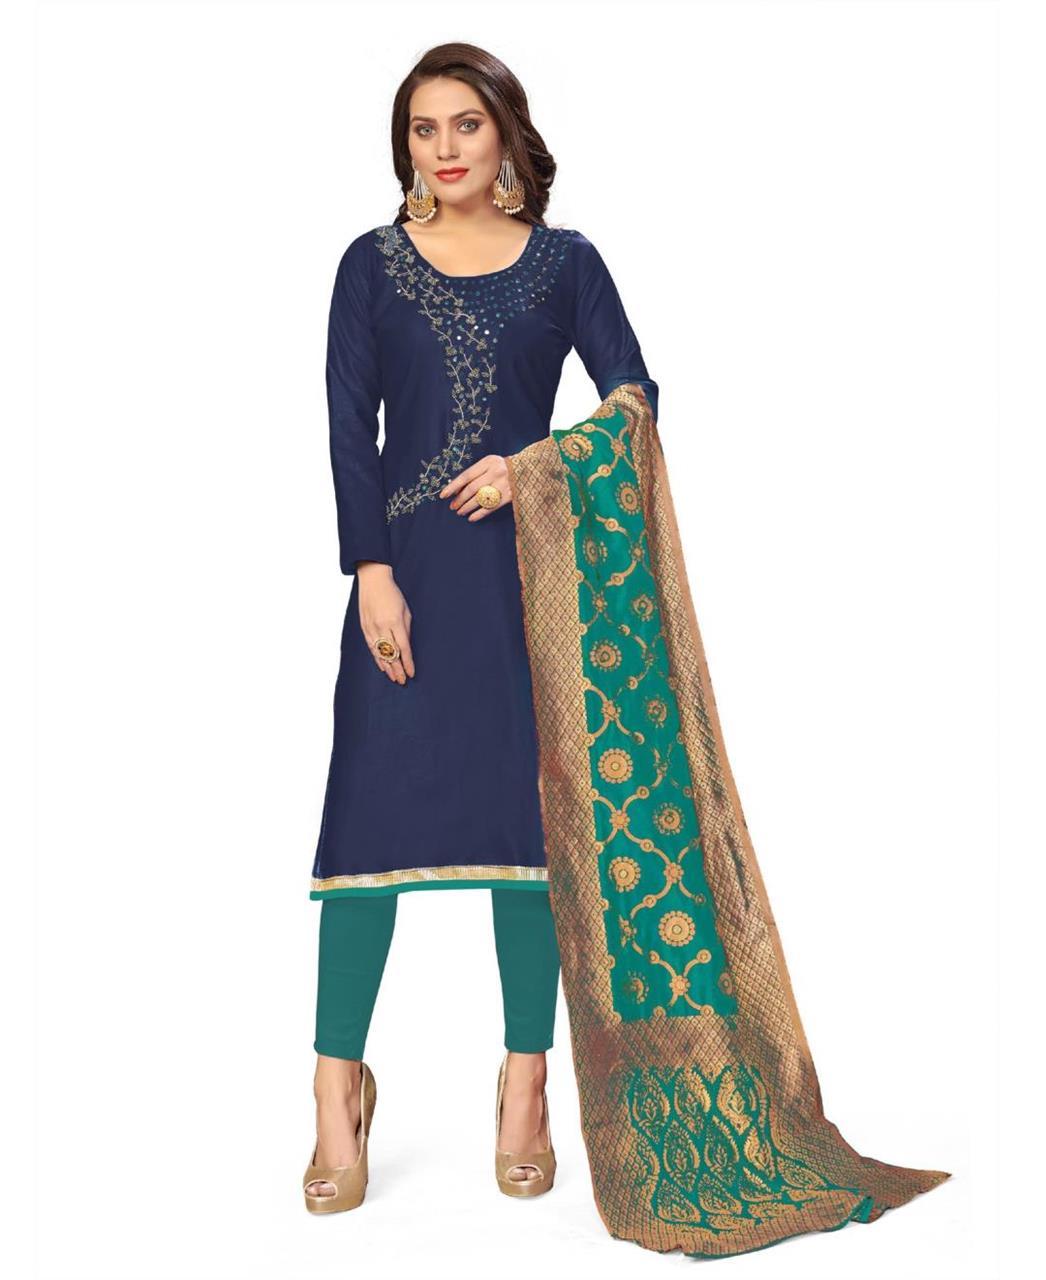 Cotton Straight cut Salwar Kameez in Navy Blue